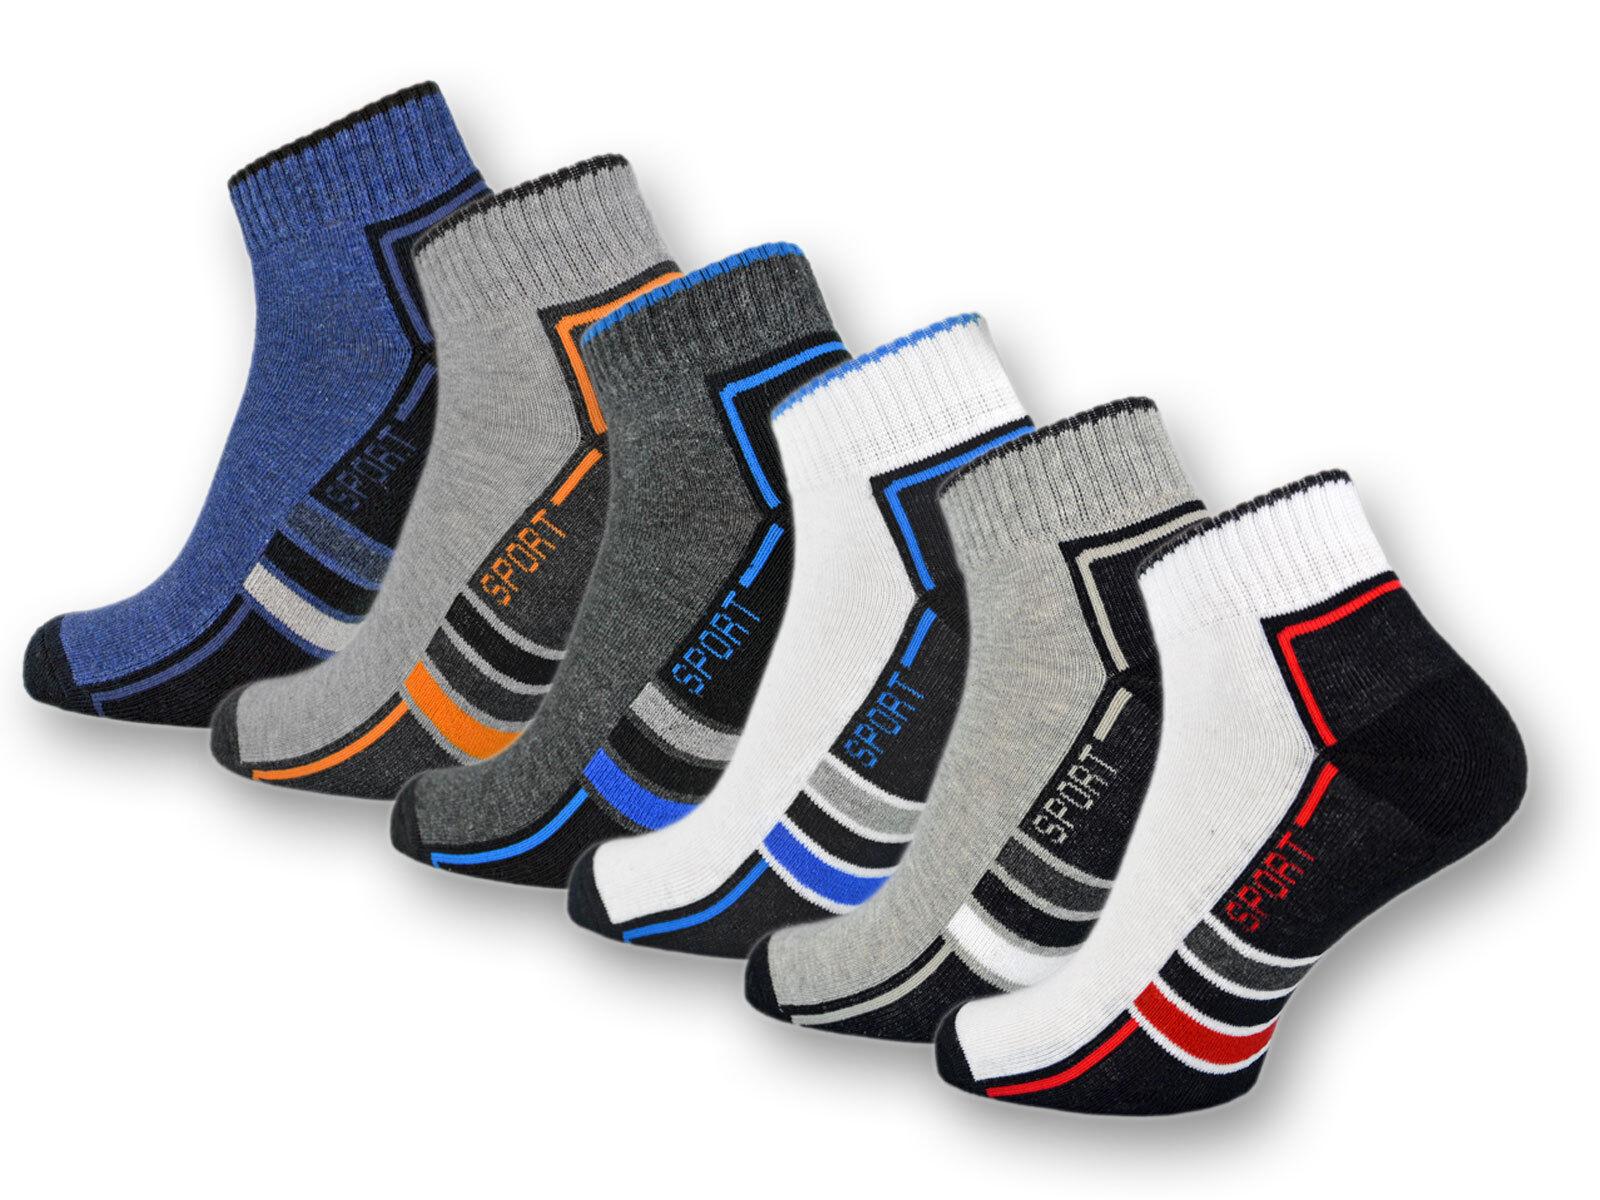 6 oder 12 Paar Sport Sneaker Socken Herrensocken mit verstärkter Frotteesohle